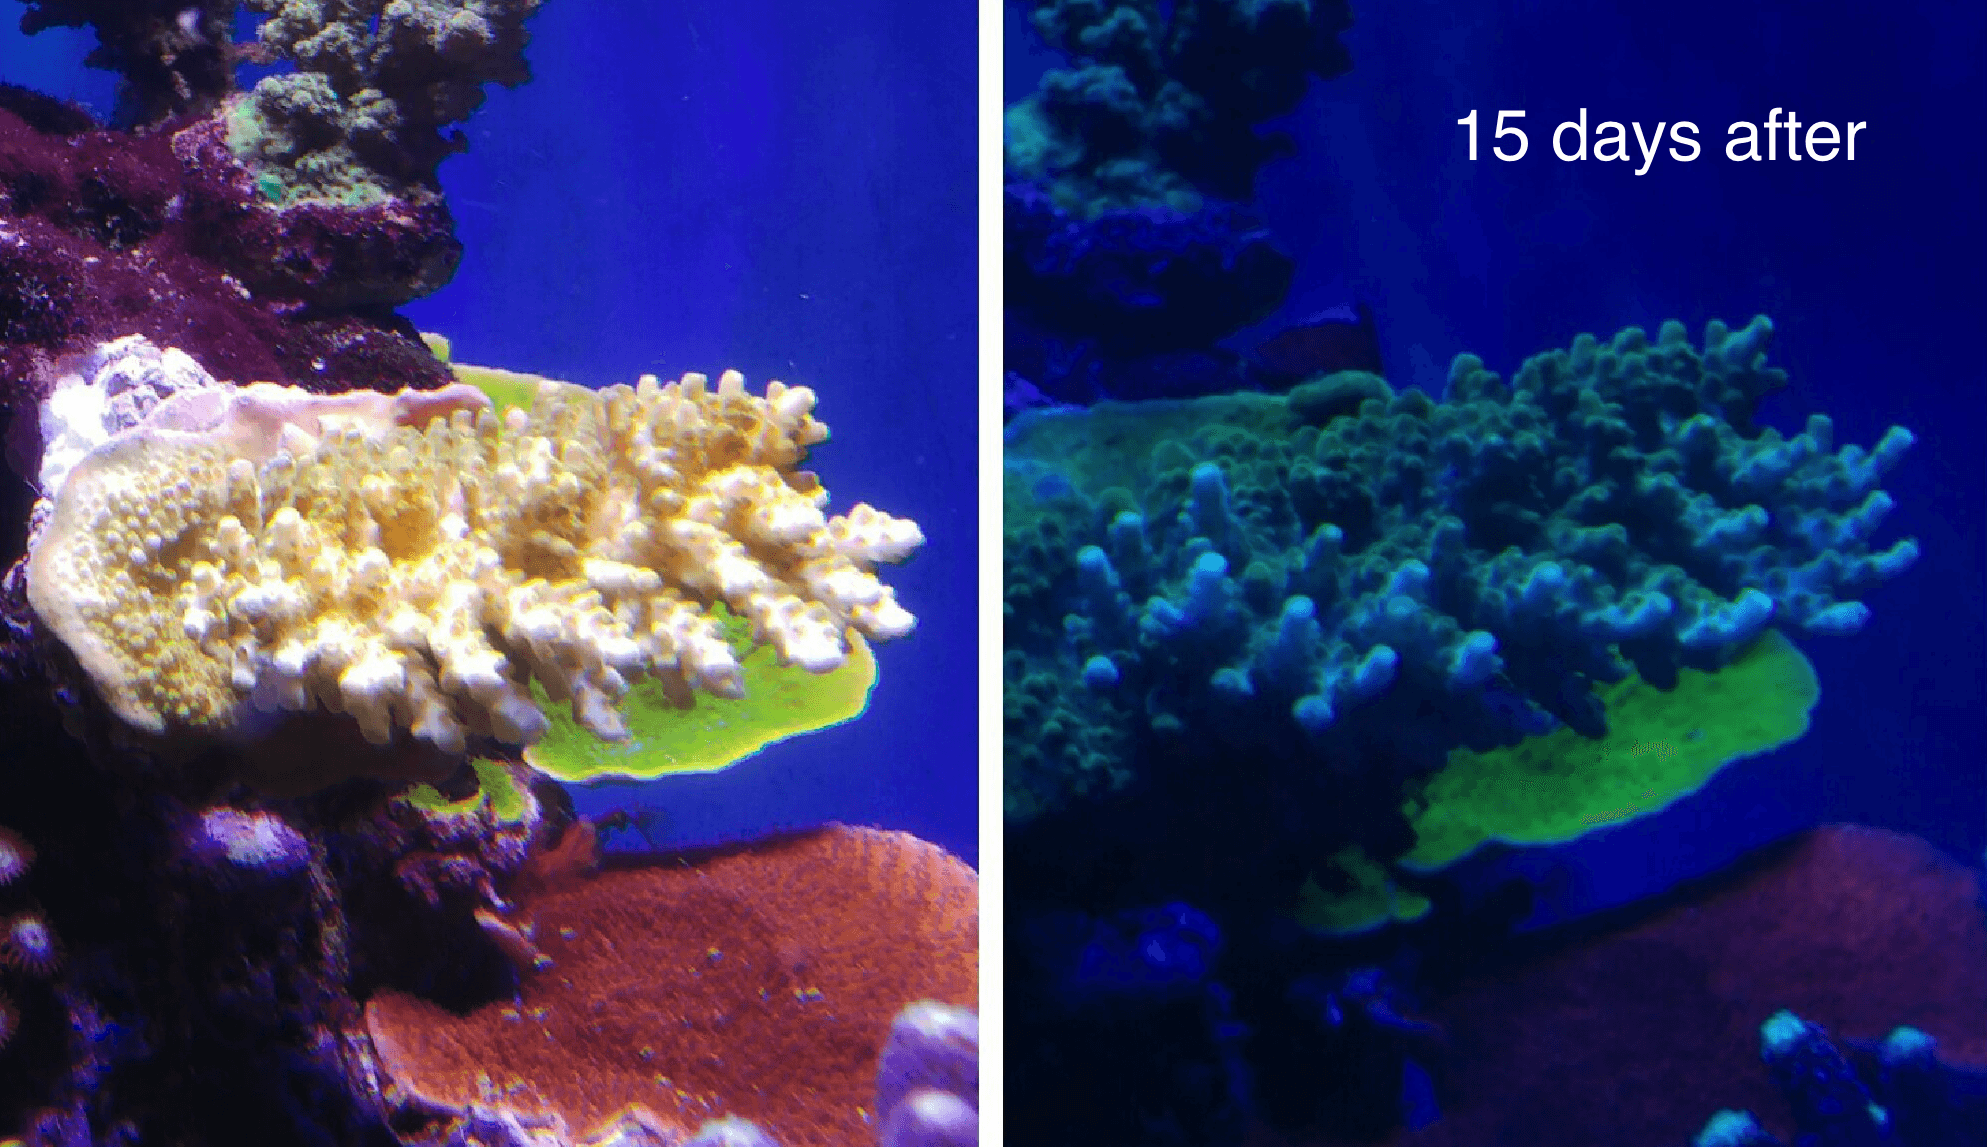 Coral Color Amp Growth Under Atlantik Compact Aquarium Led